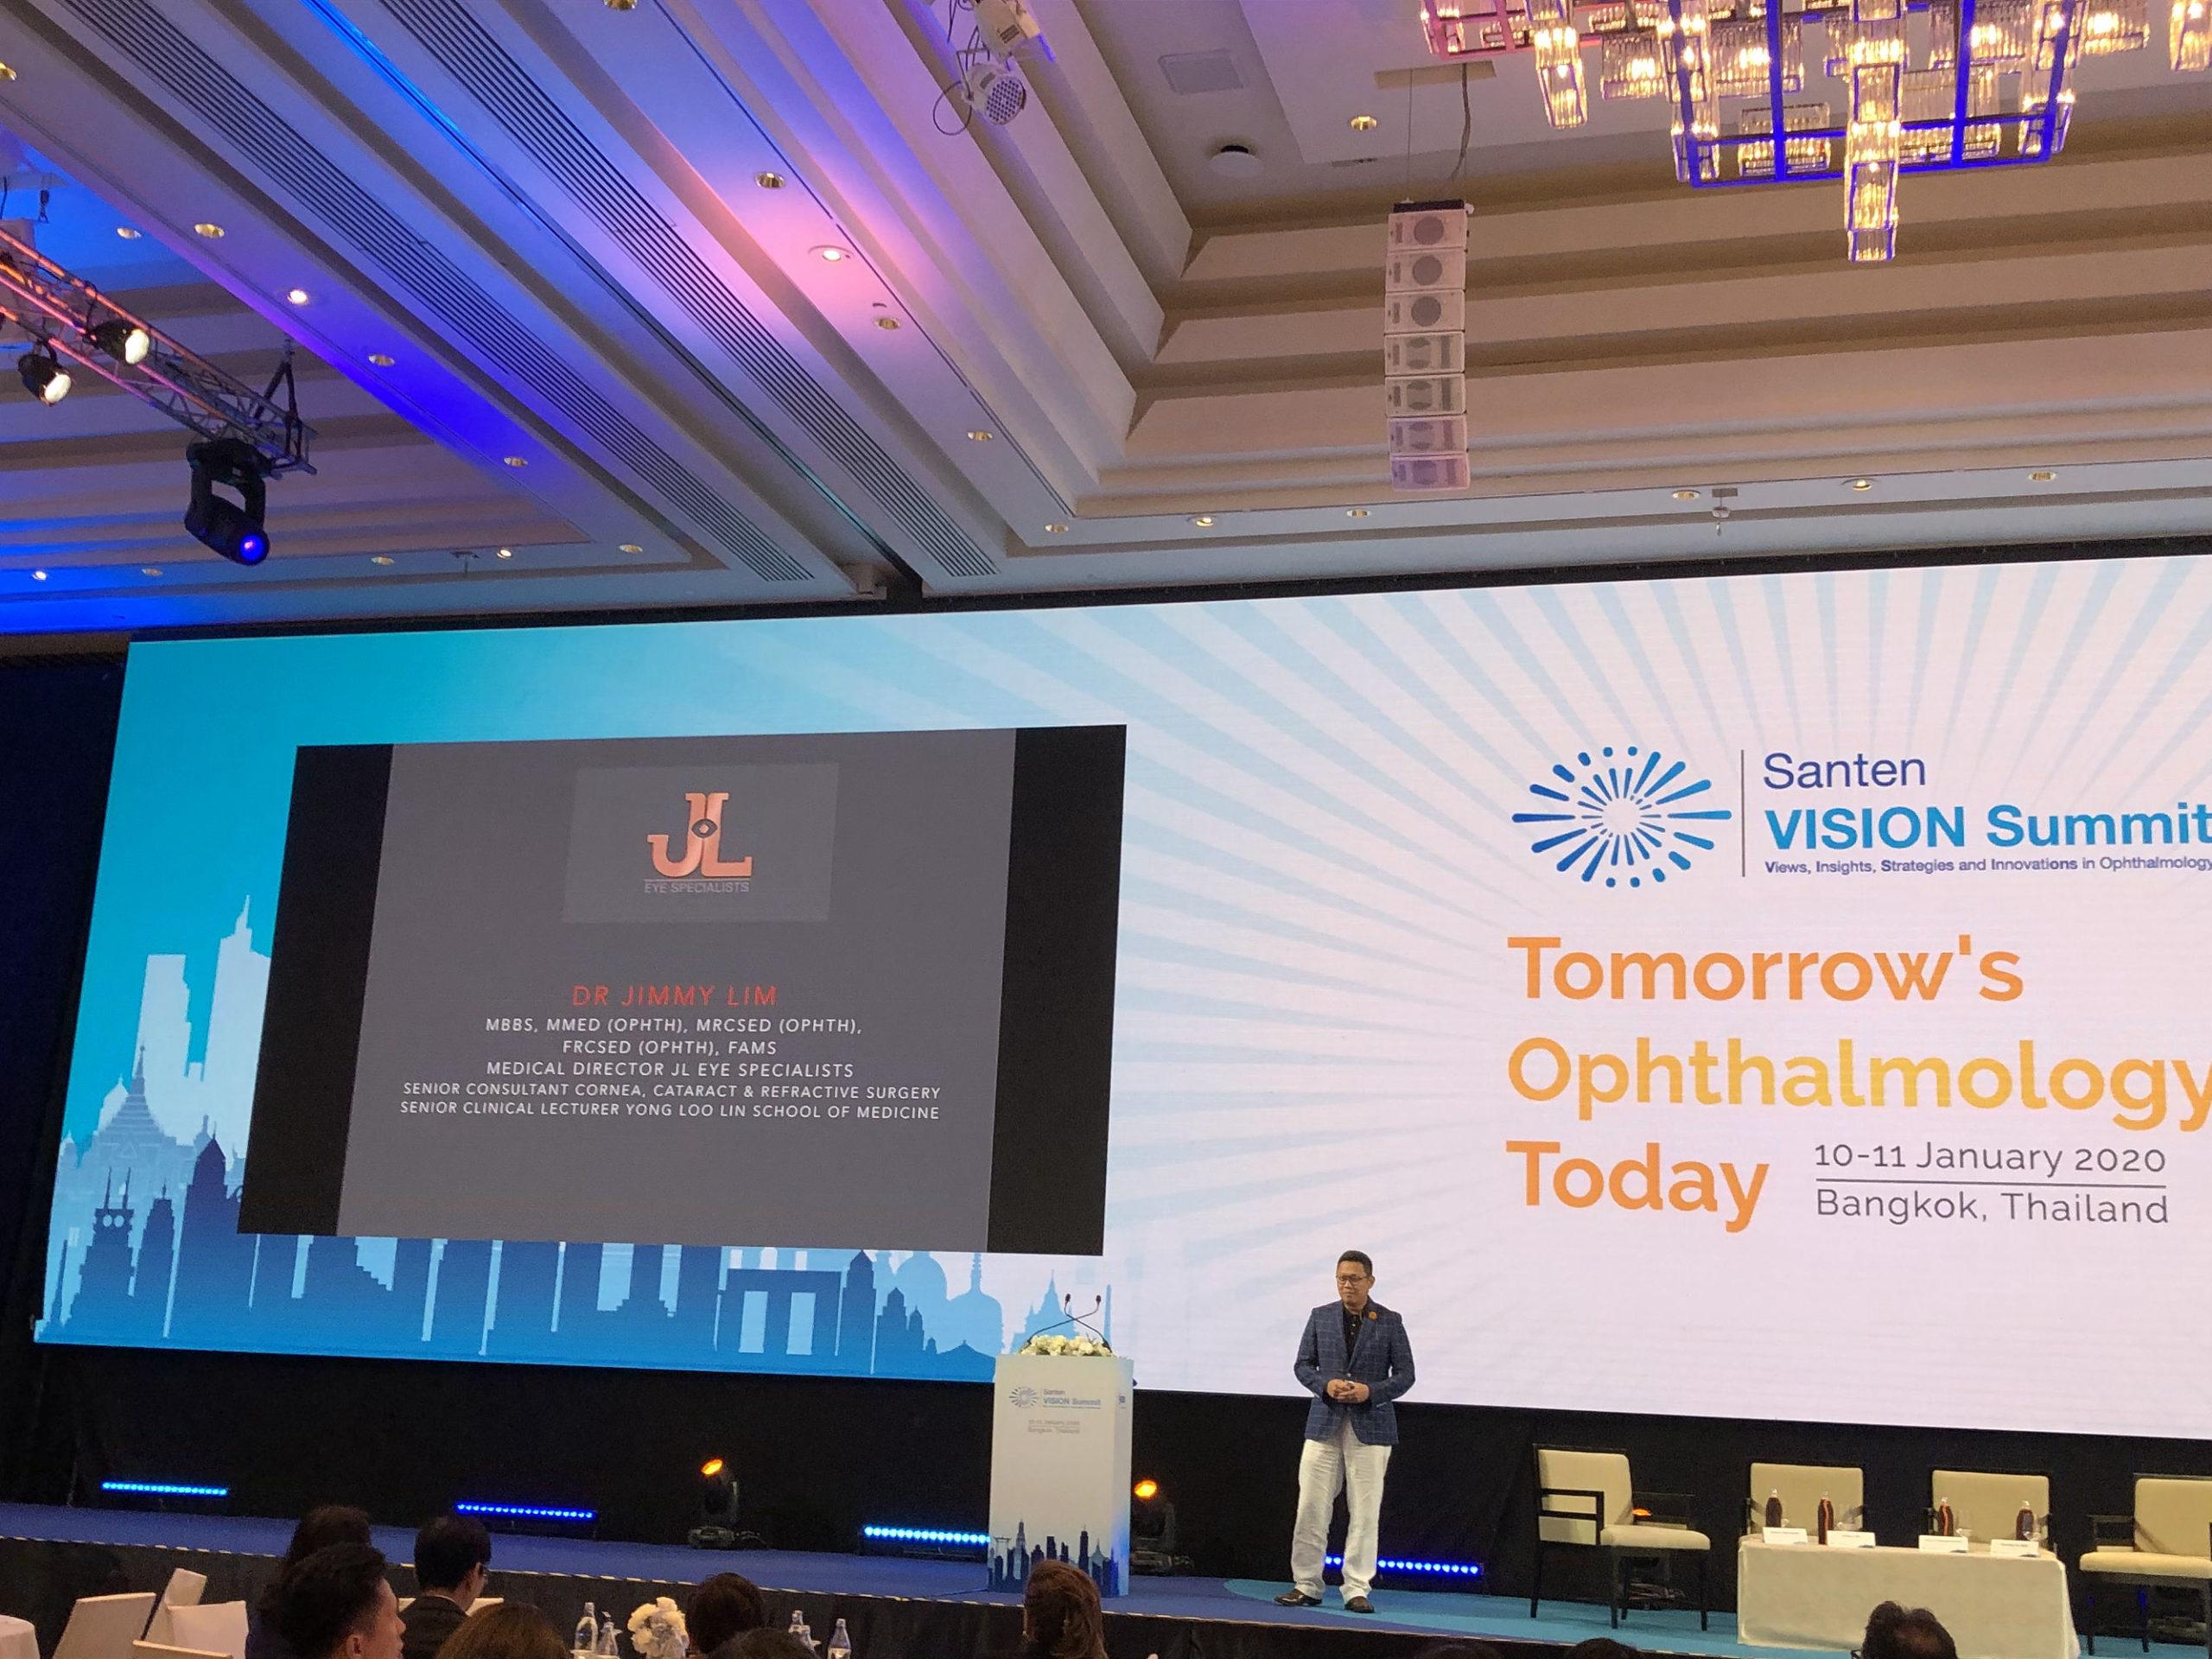 Tomorrow's Opthalmology, Today, Santen Vision Summit 2020, Bangkok, Thailand